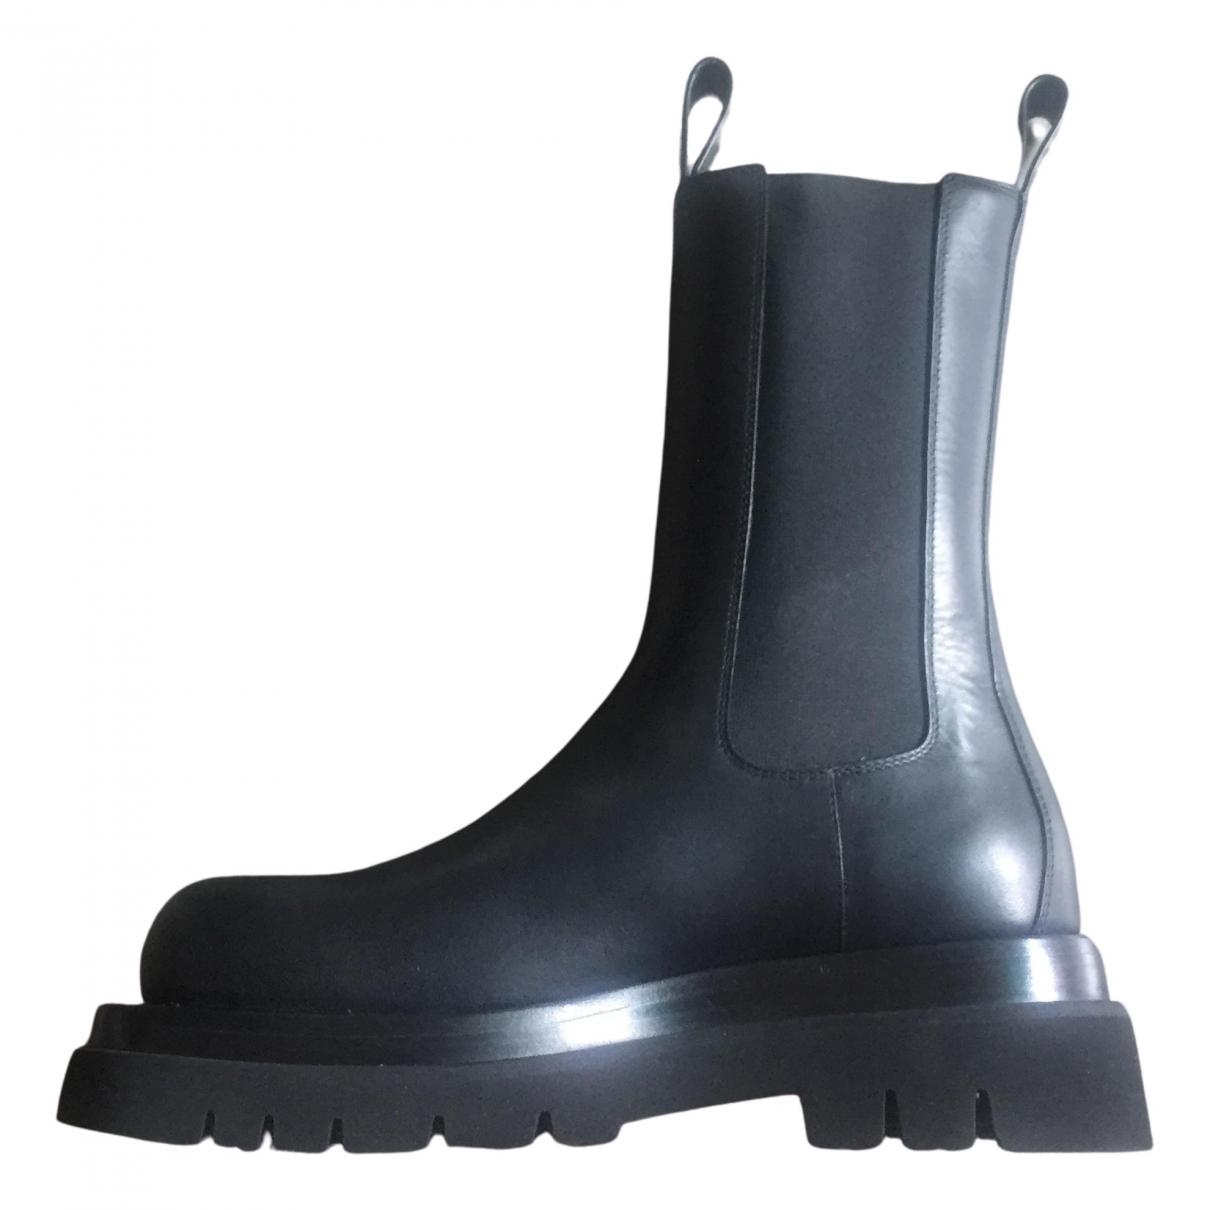 Bottega Veneta \N Black Leather Boots for Women 37 EU